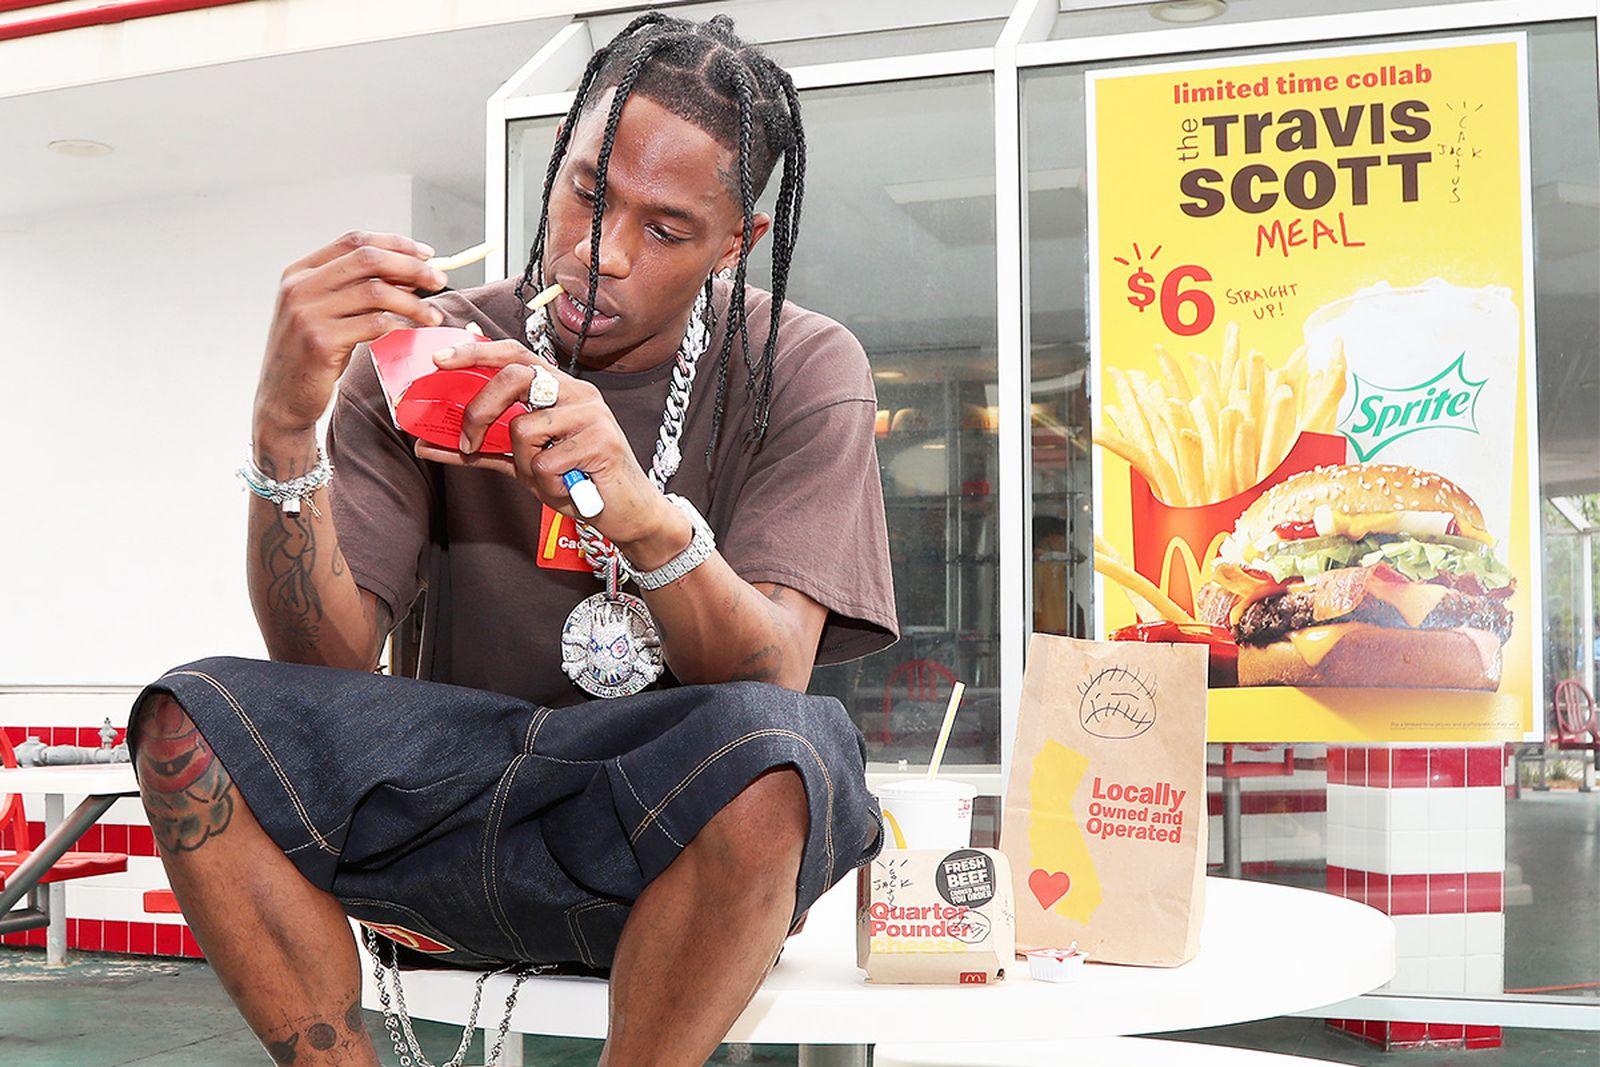 travis scott eating a McDonald's burger